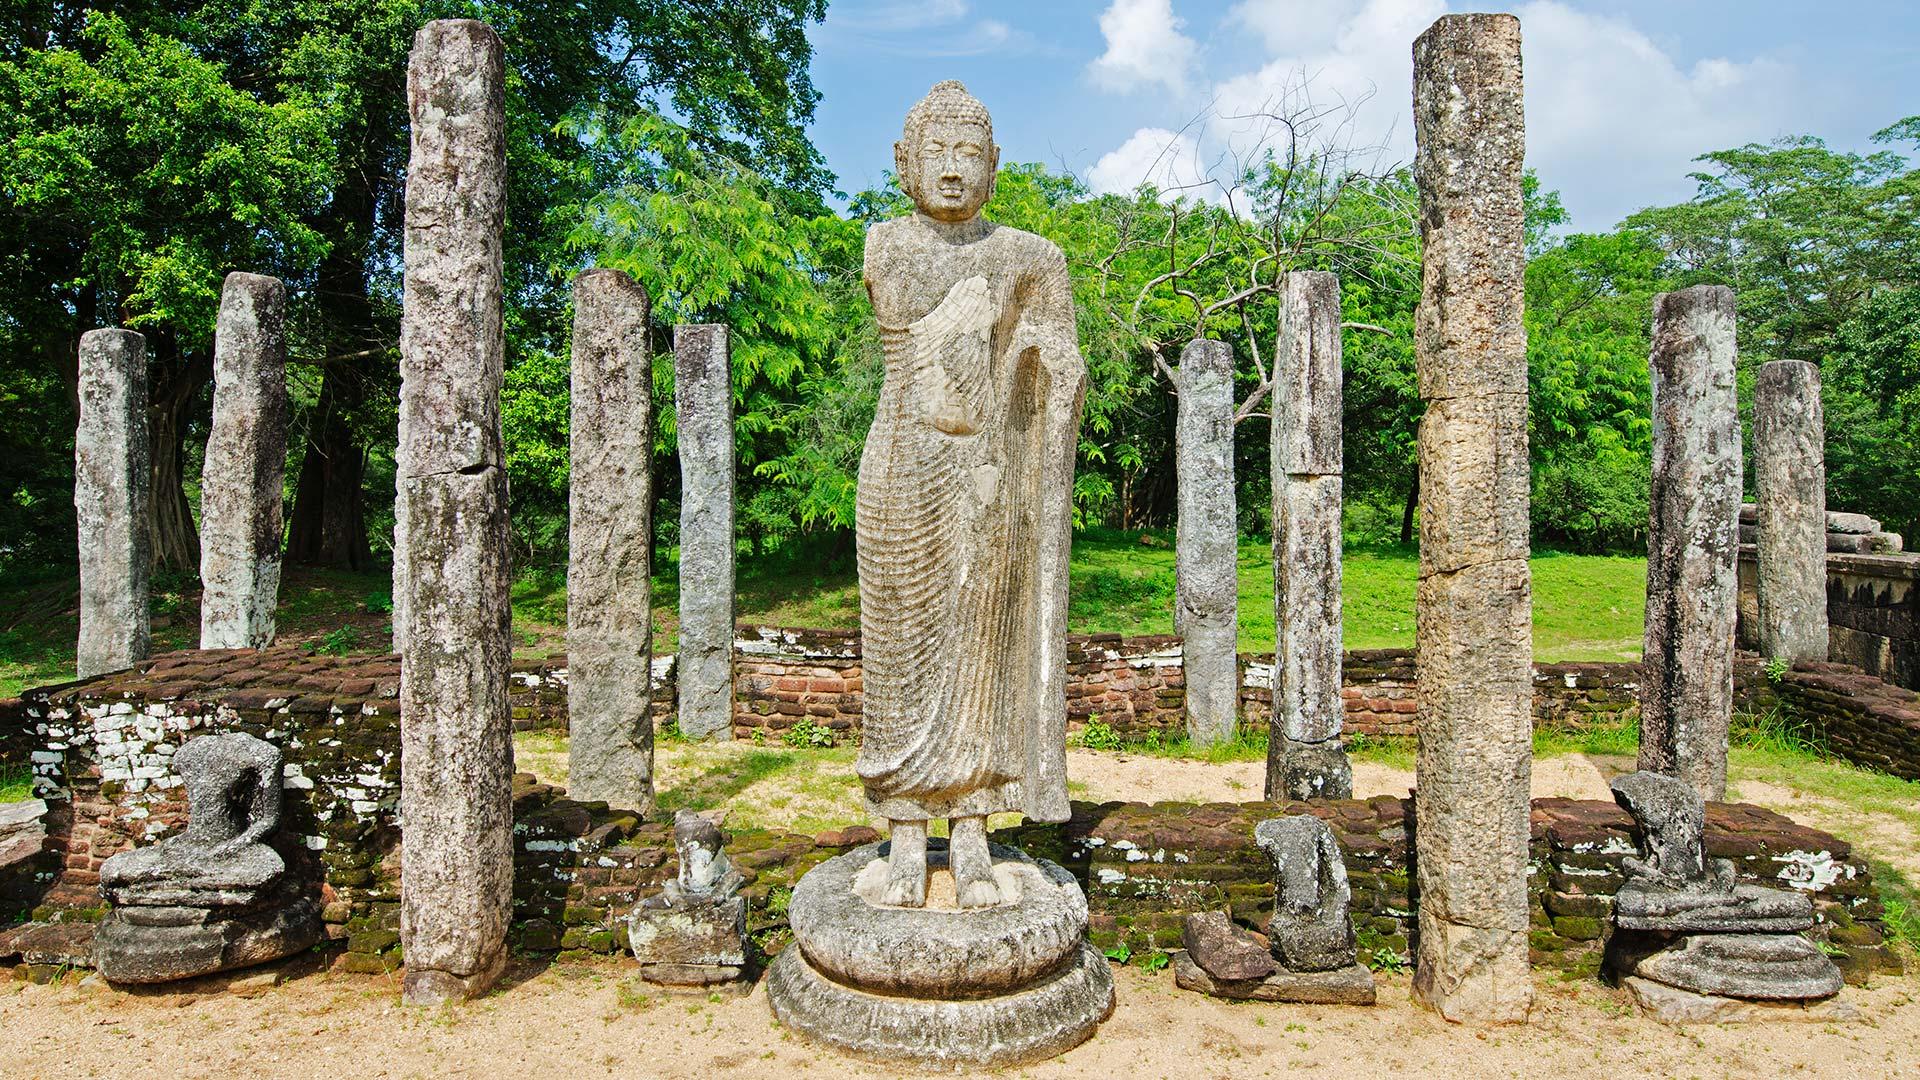 Standing buddha at Polonnaruwa, a UNESCO World Heritage Site in Sri Lanka.